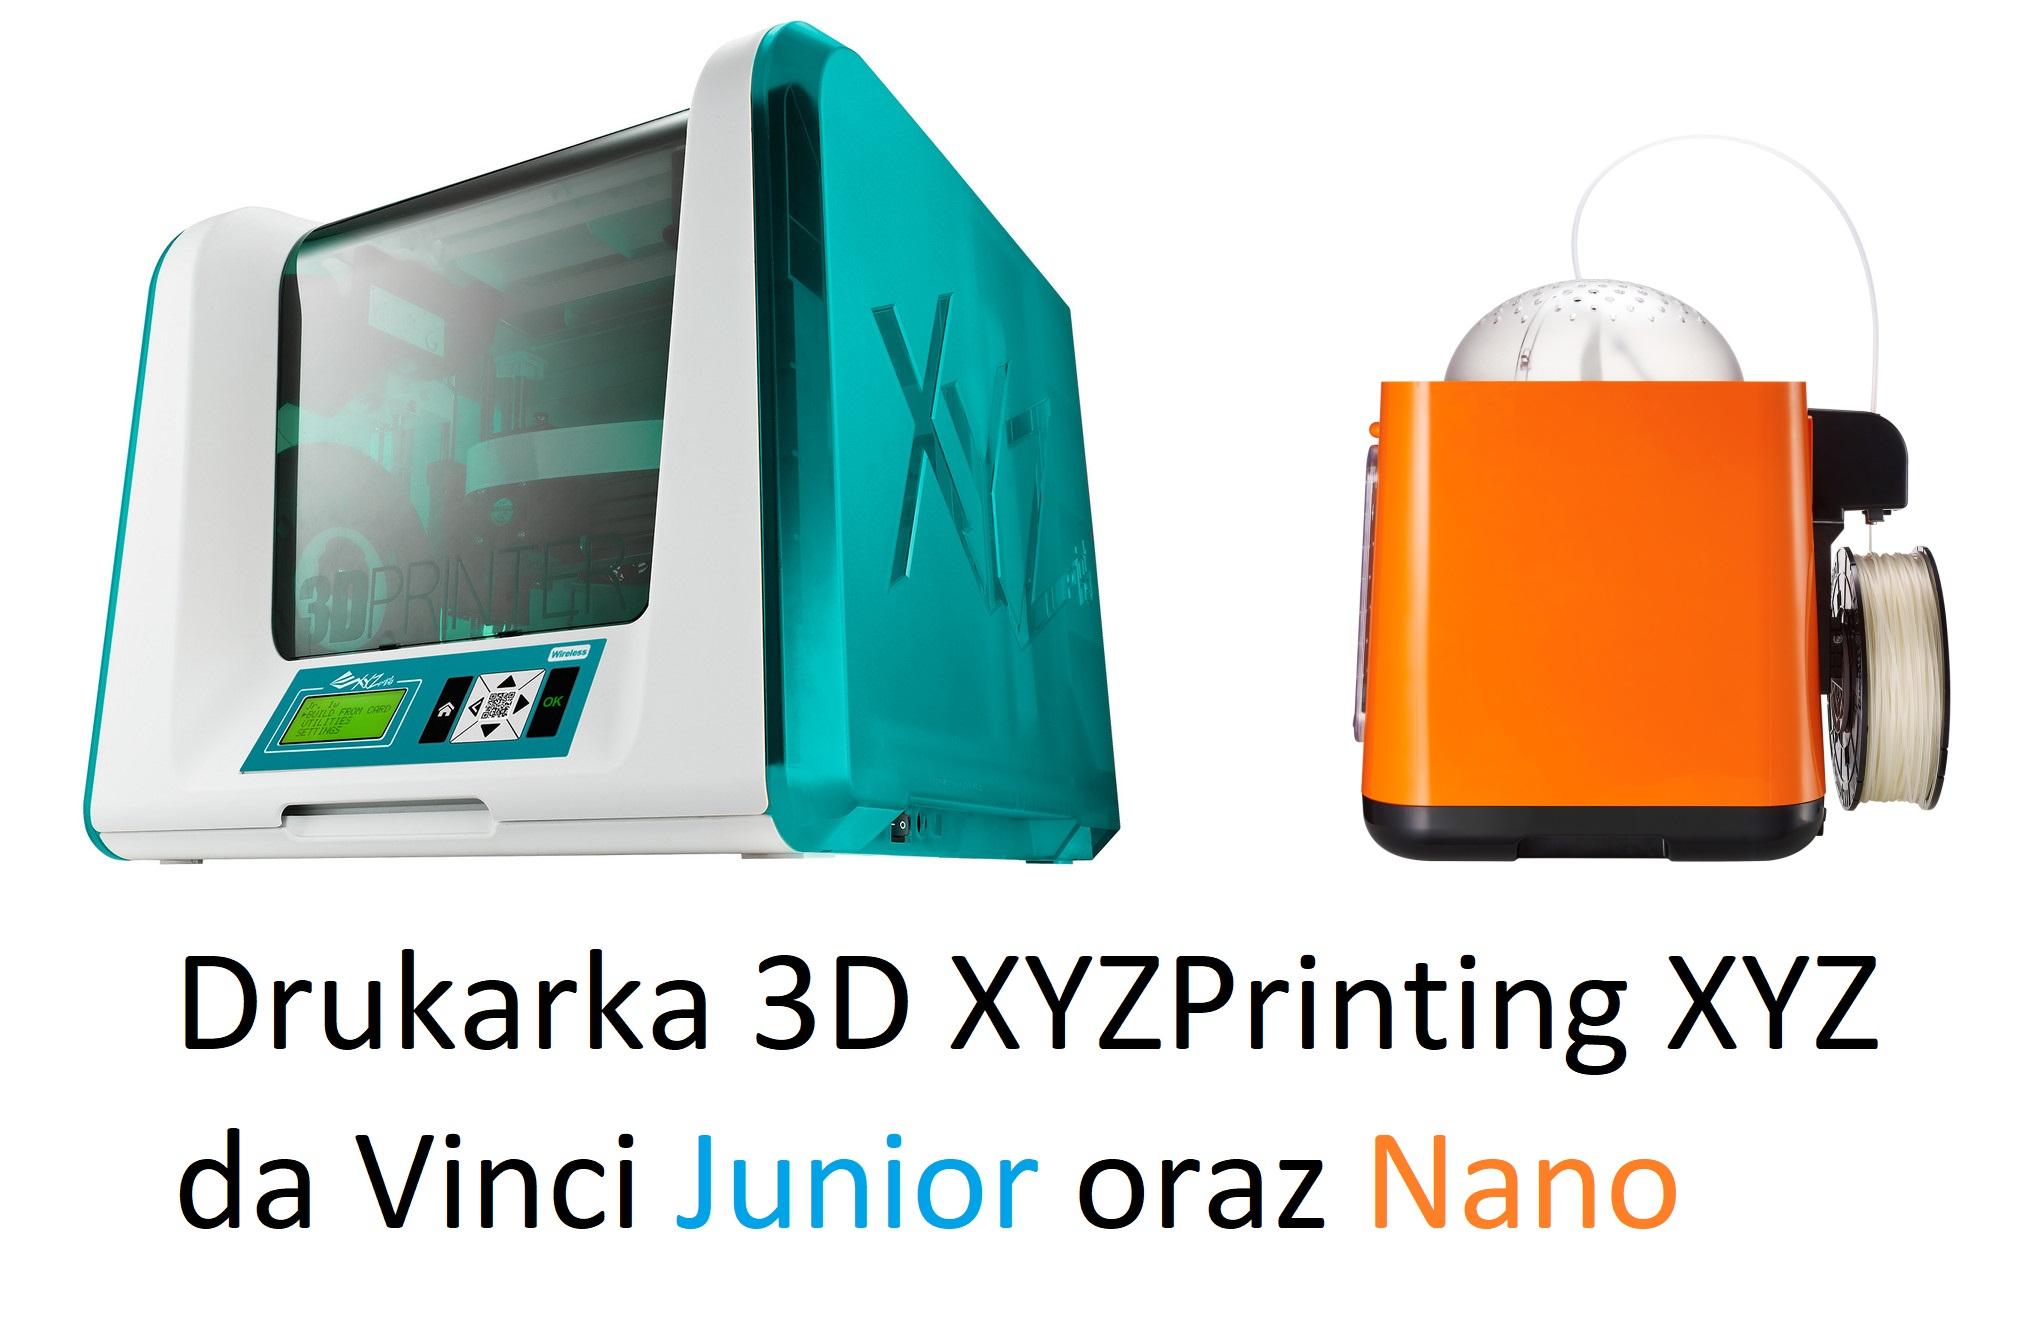 Drukarka XYZ Printing 3D Da Vinci Junior (1024,95) oraz Nano (429,95). Dostawa 39,95.